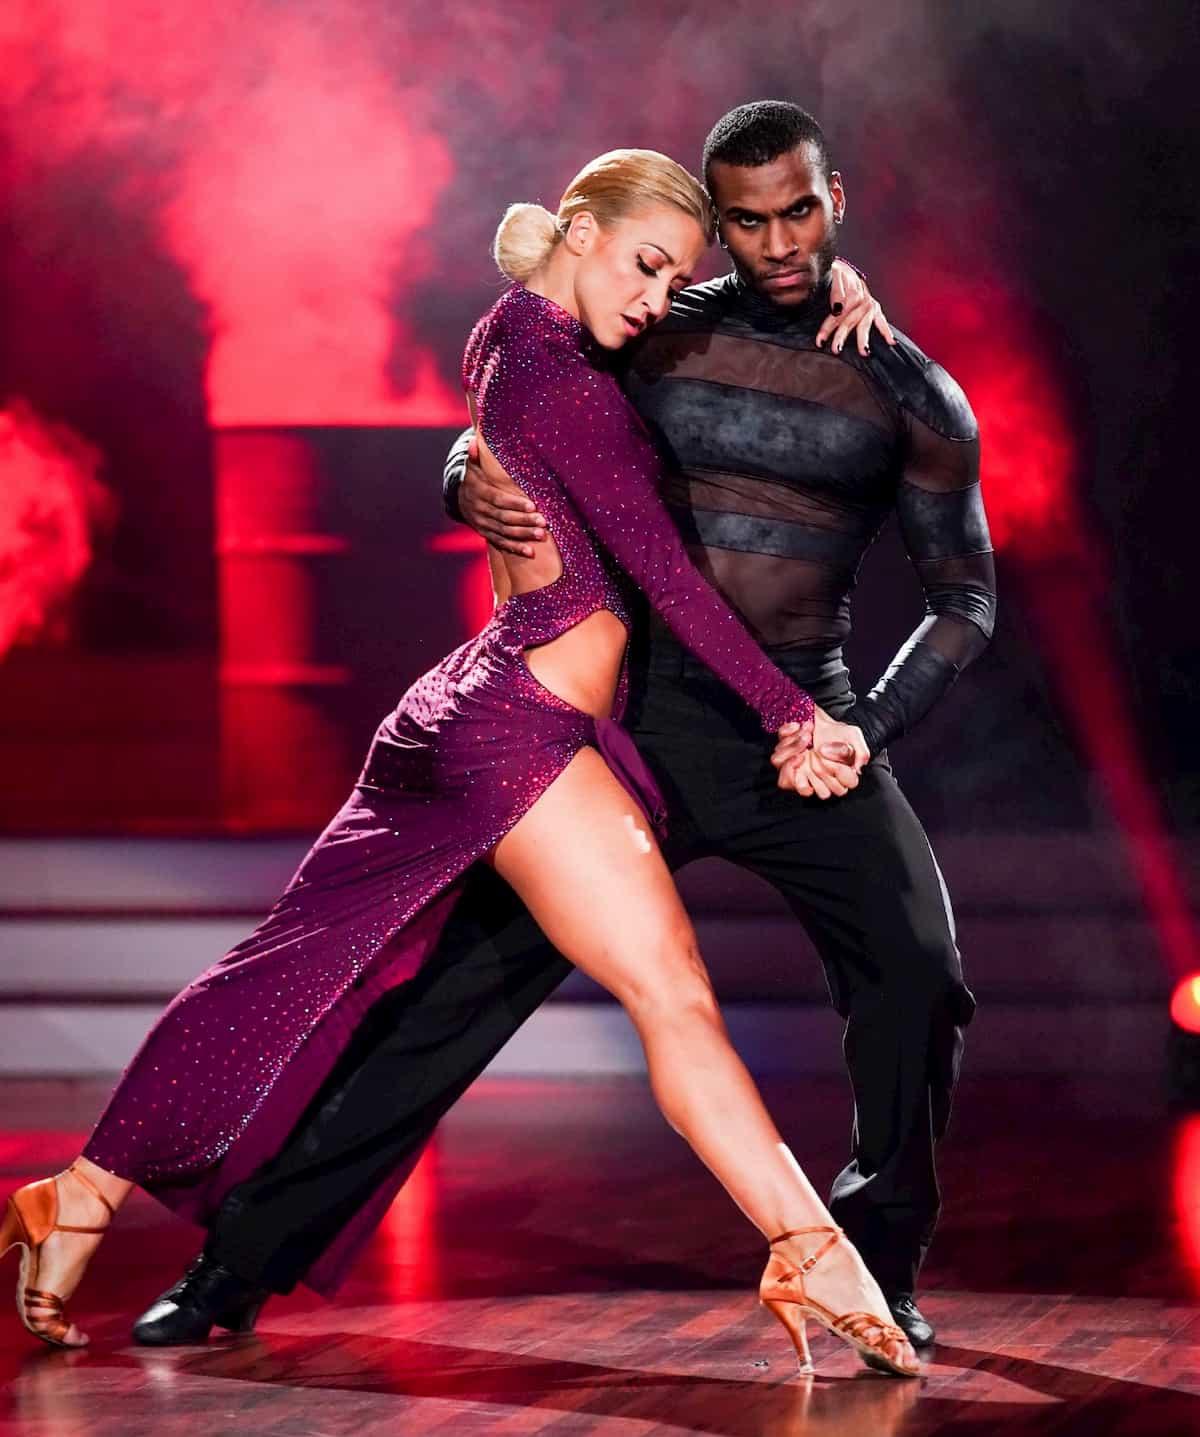 Kathrin Menzinger und Tijan Njie bei Let's dance 2020 am 28.2.2020